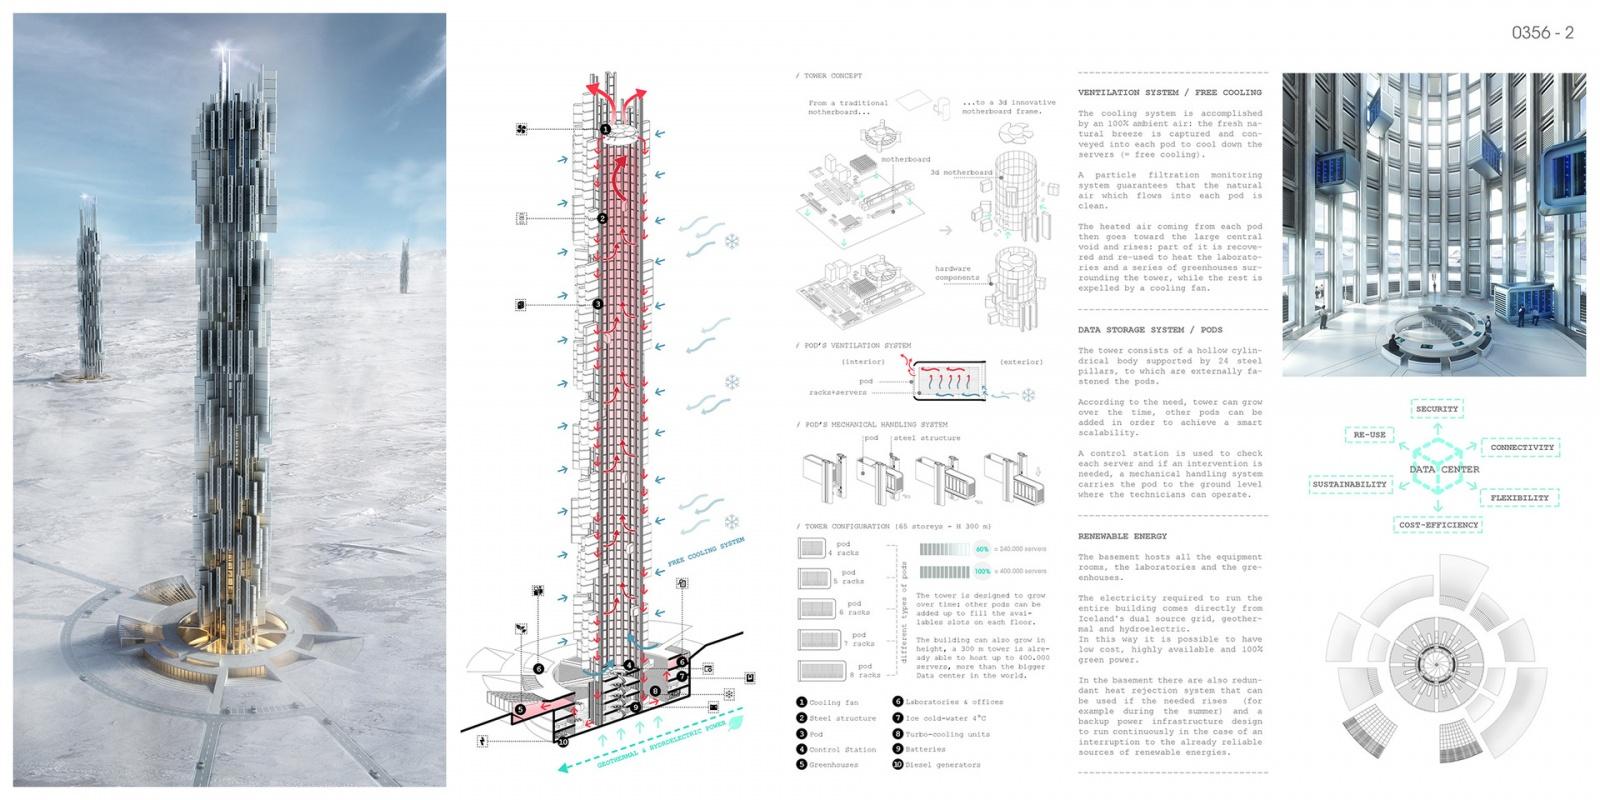 Небоскреб с дата центром Data Tower - 3